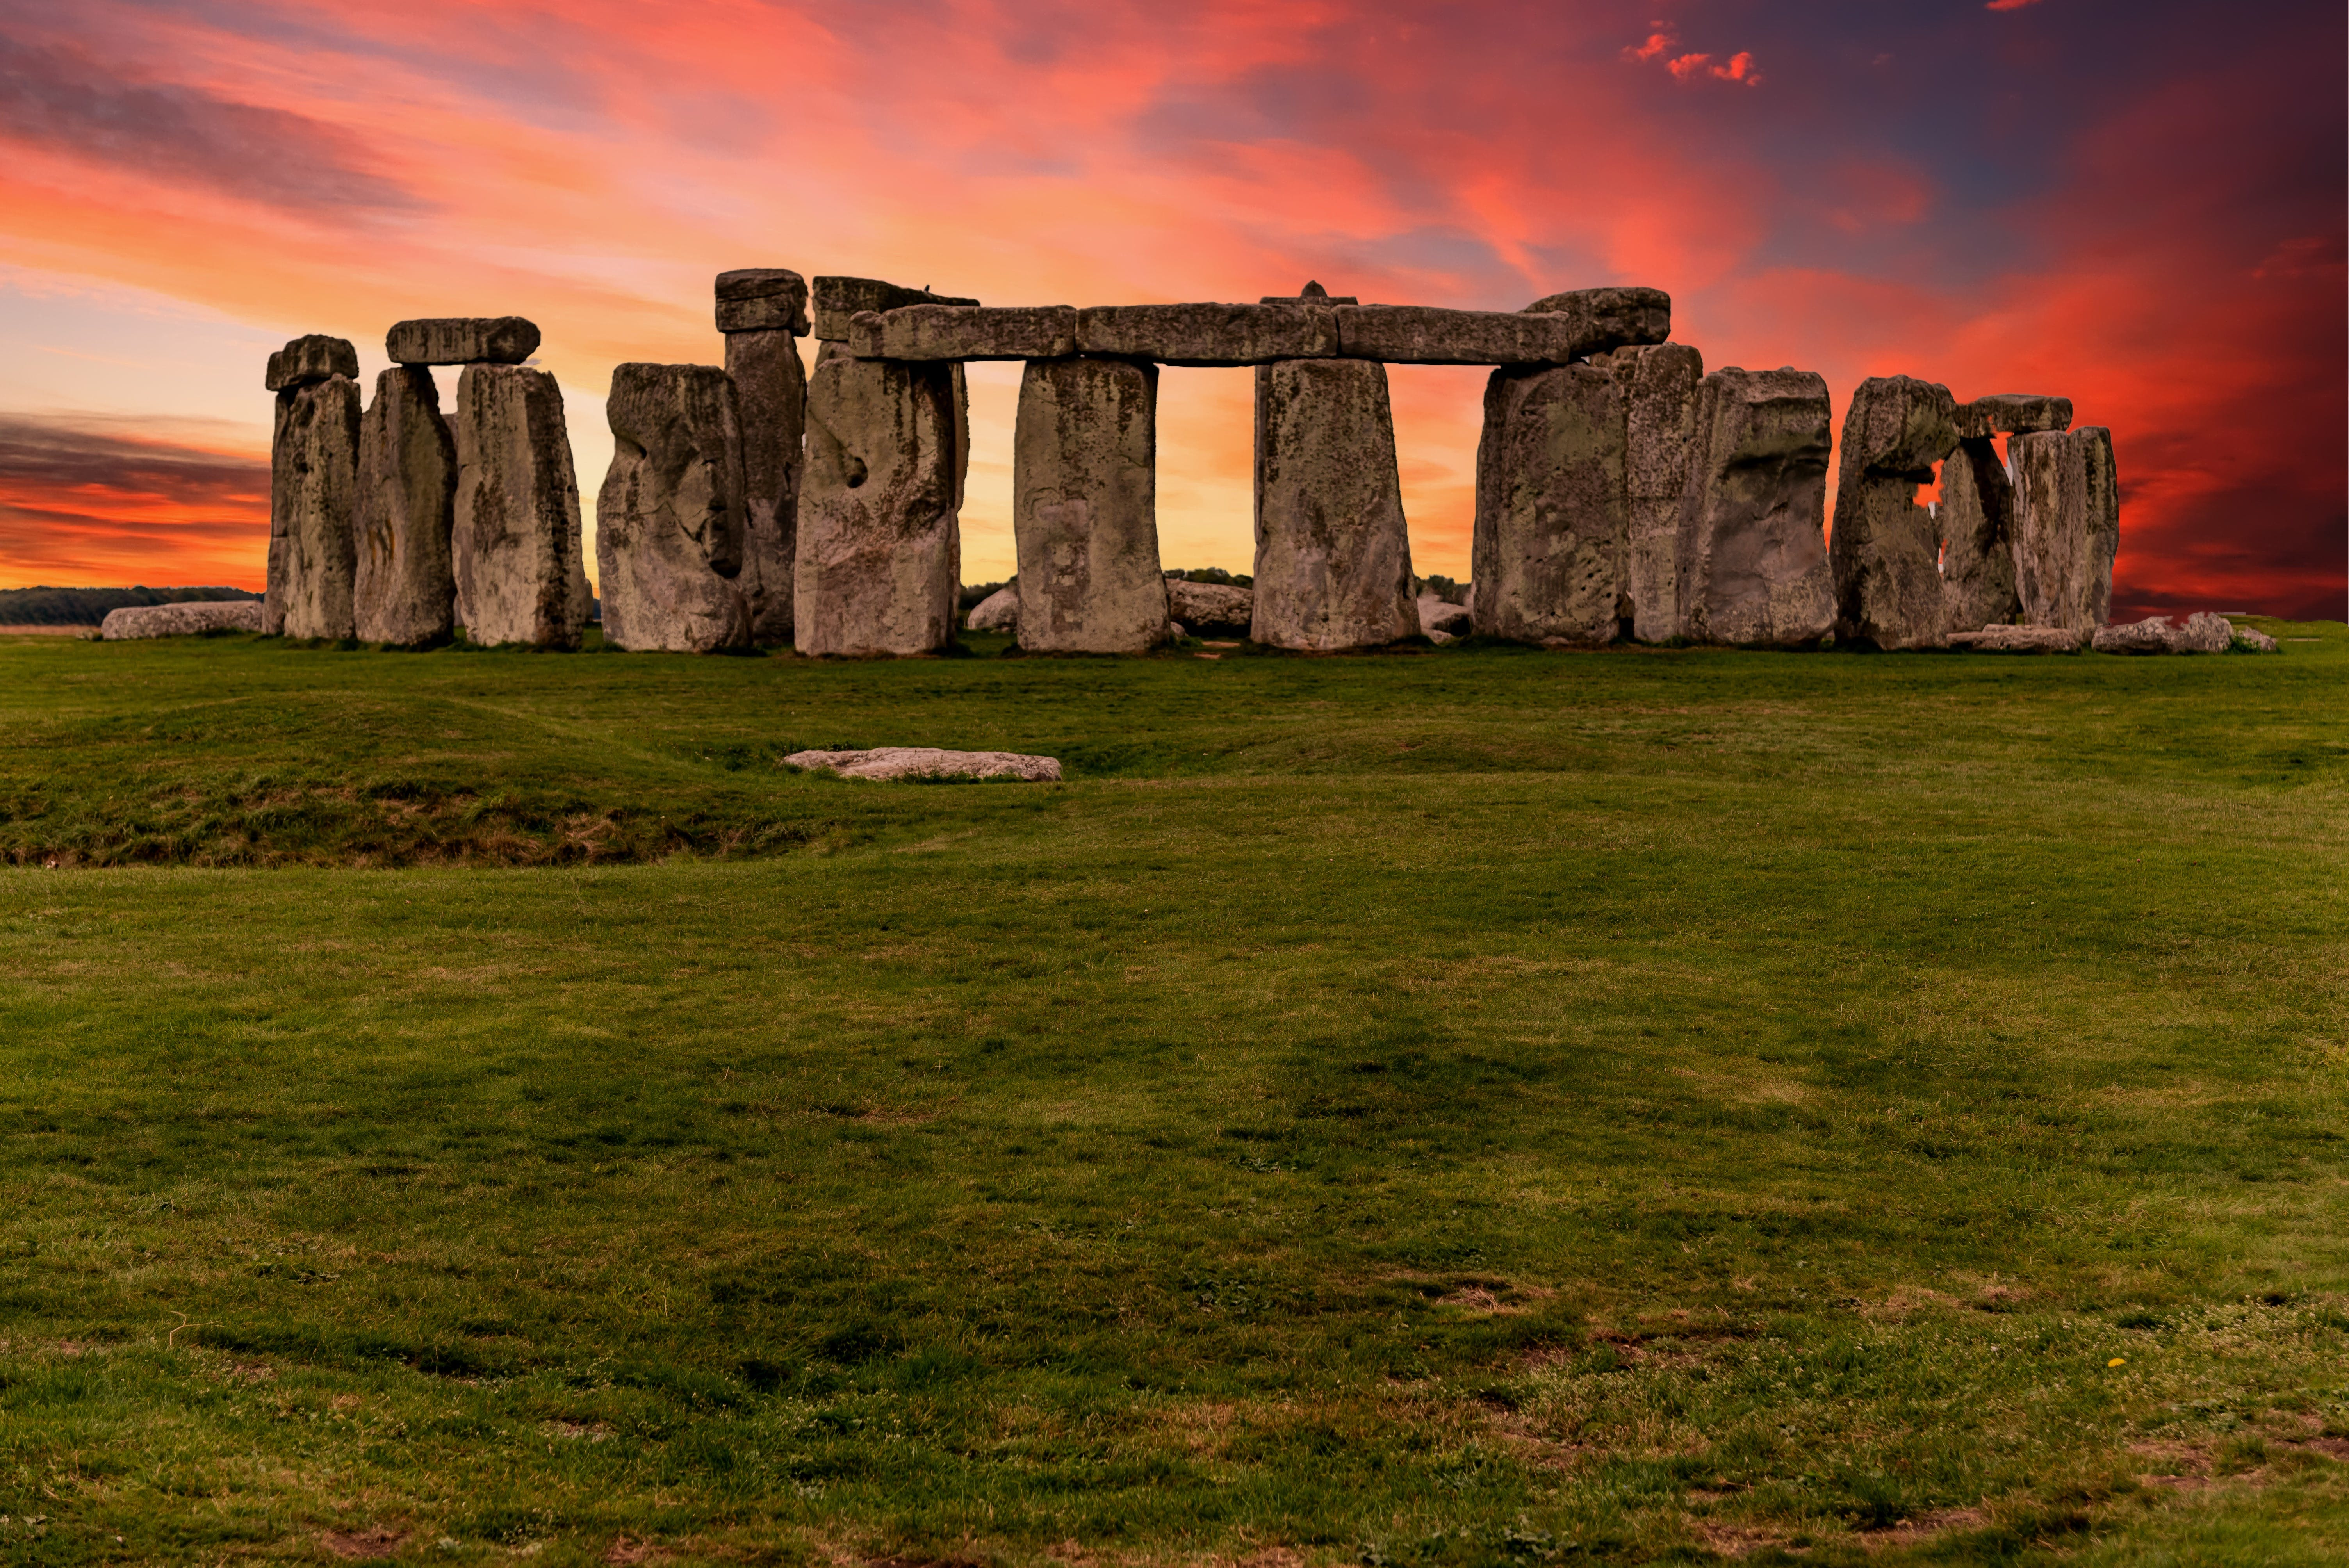 HDの壁紙, イングランド, ストーンヘンジ, ランドマークの無料の写真素材